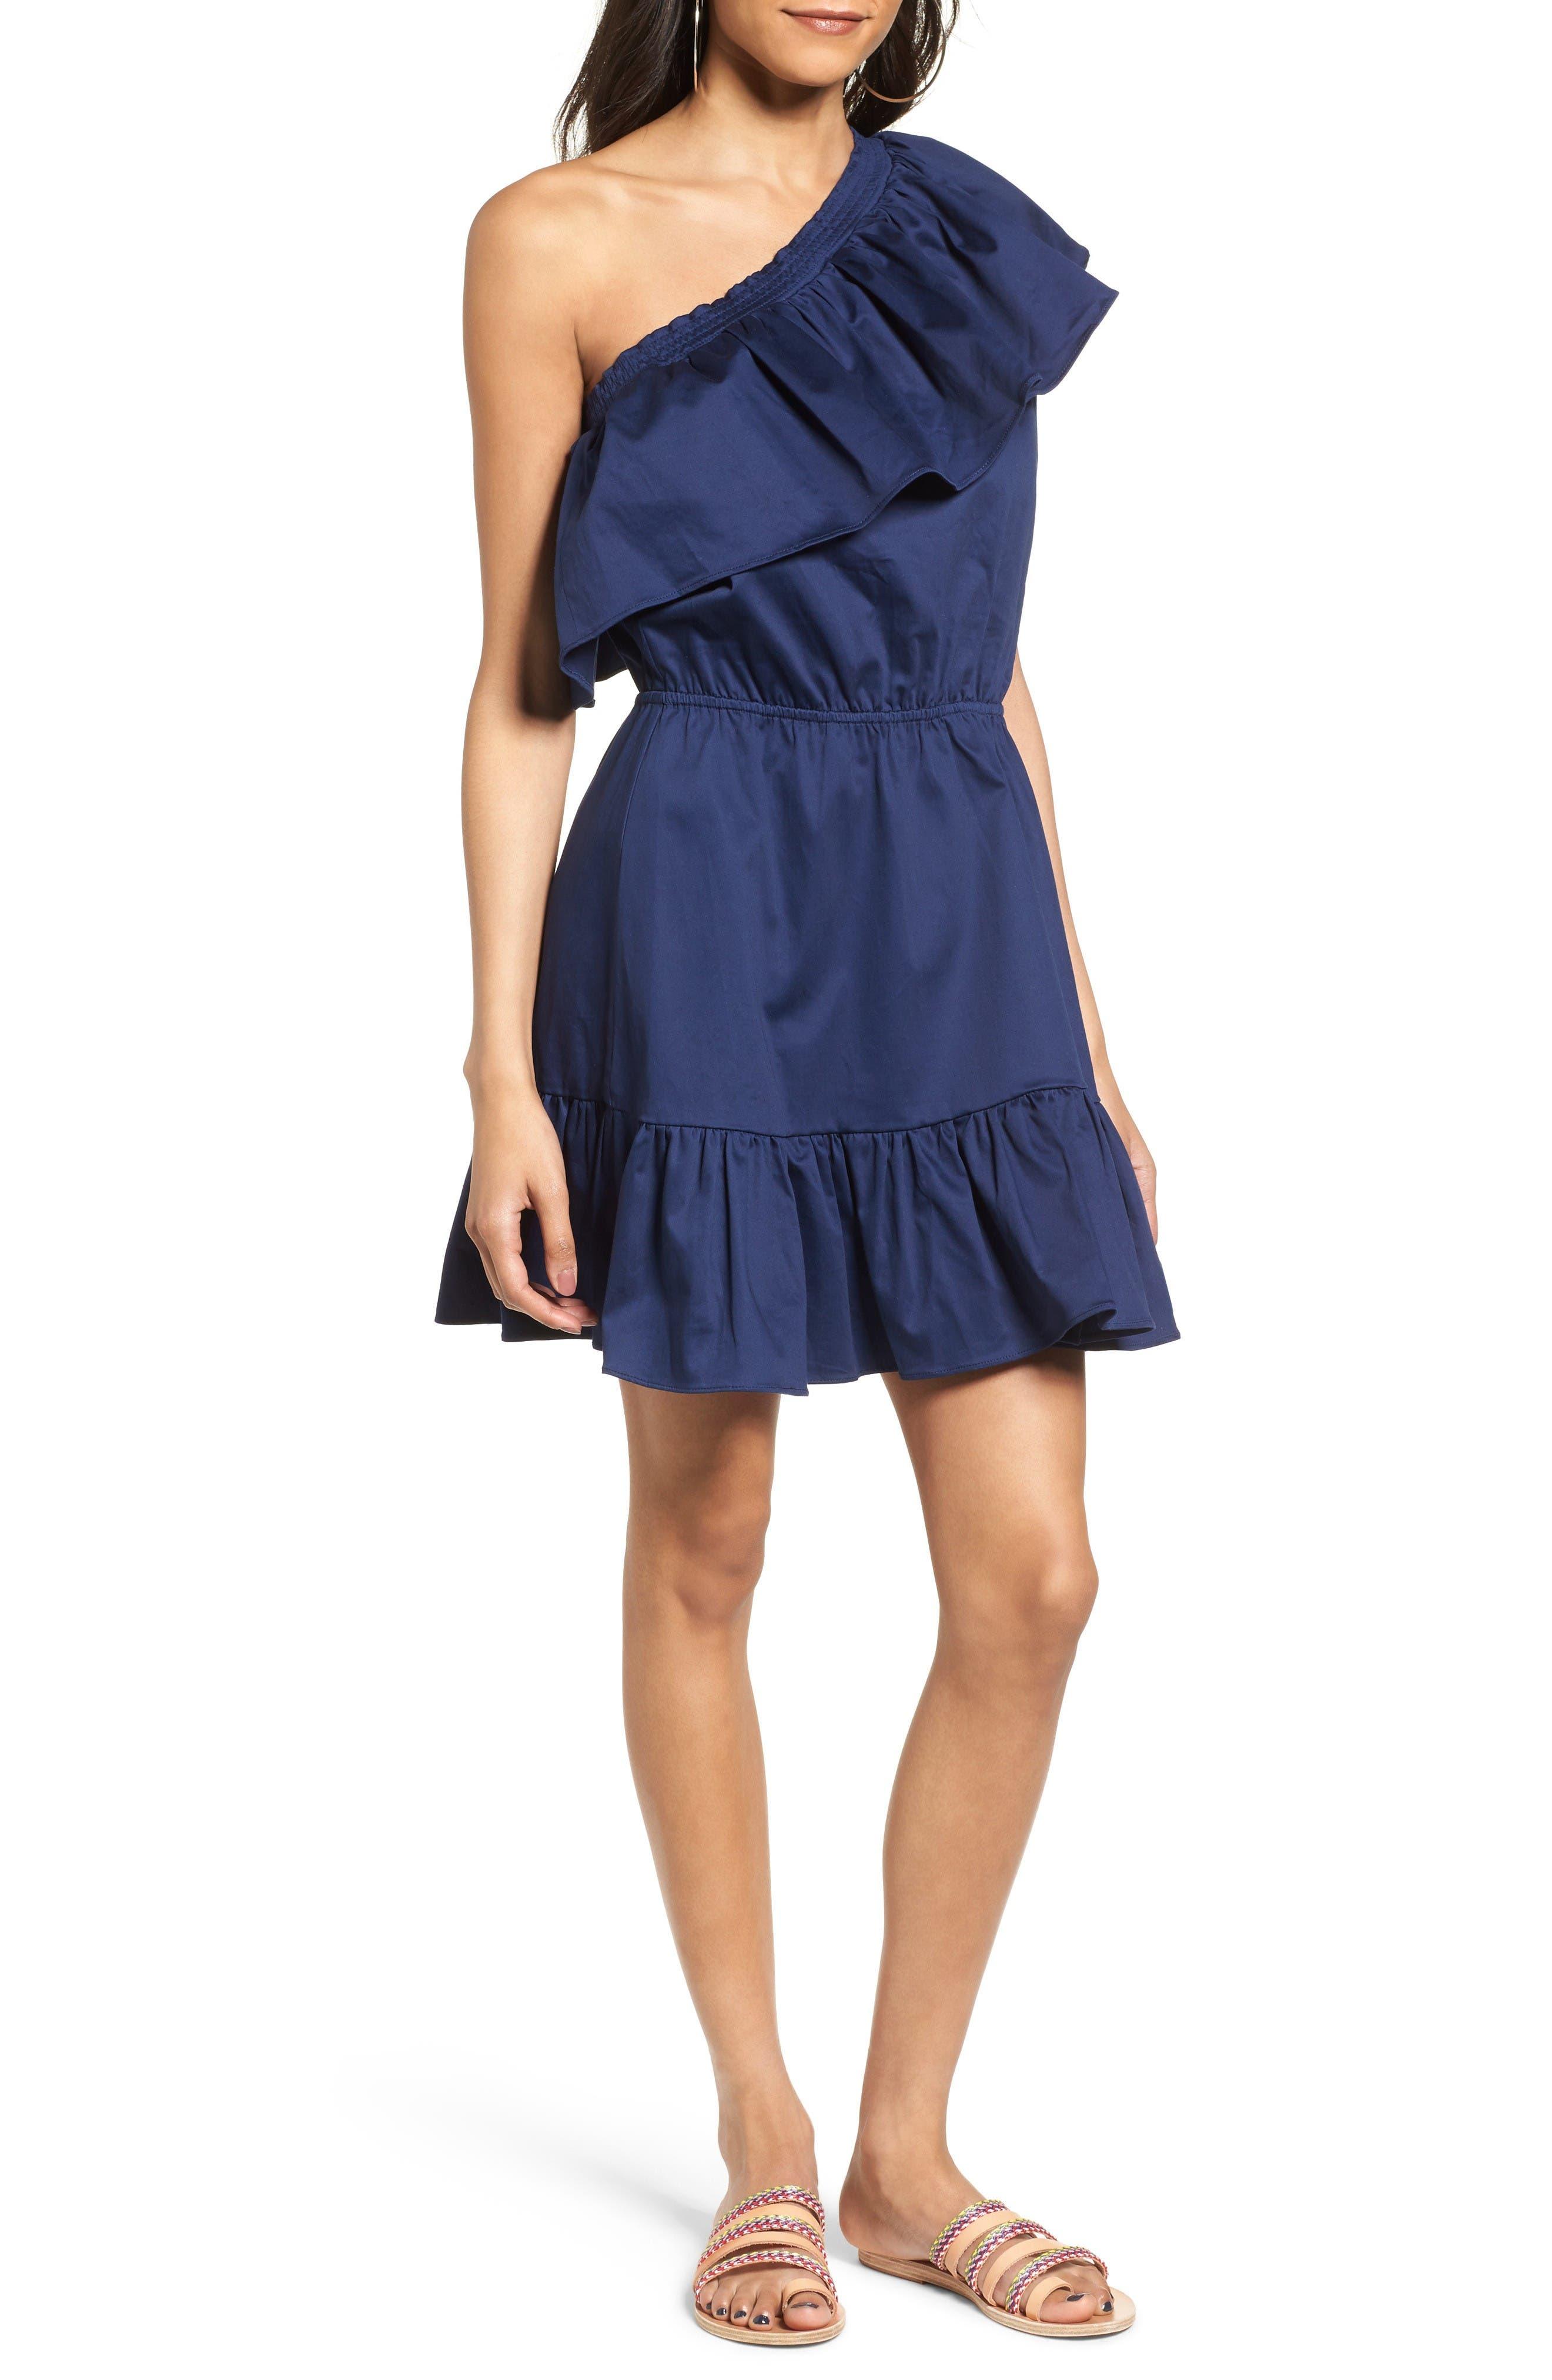 Alternate Image 1 Selected - devlin Thea One-Shoulder Fit & Flare Dress